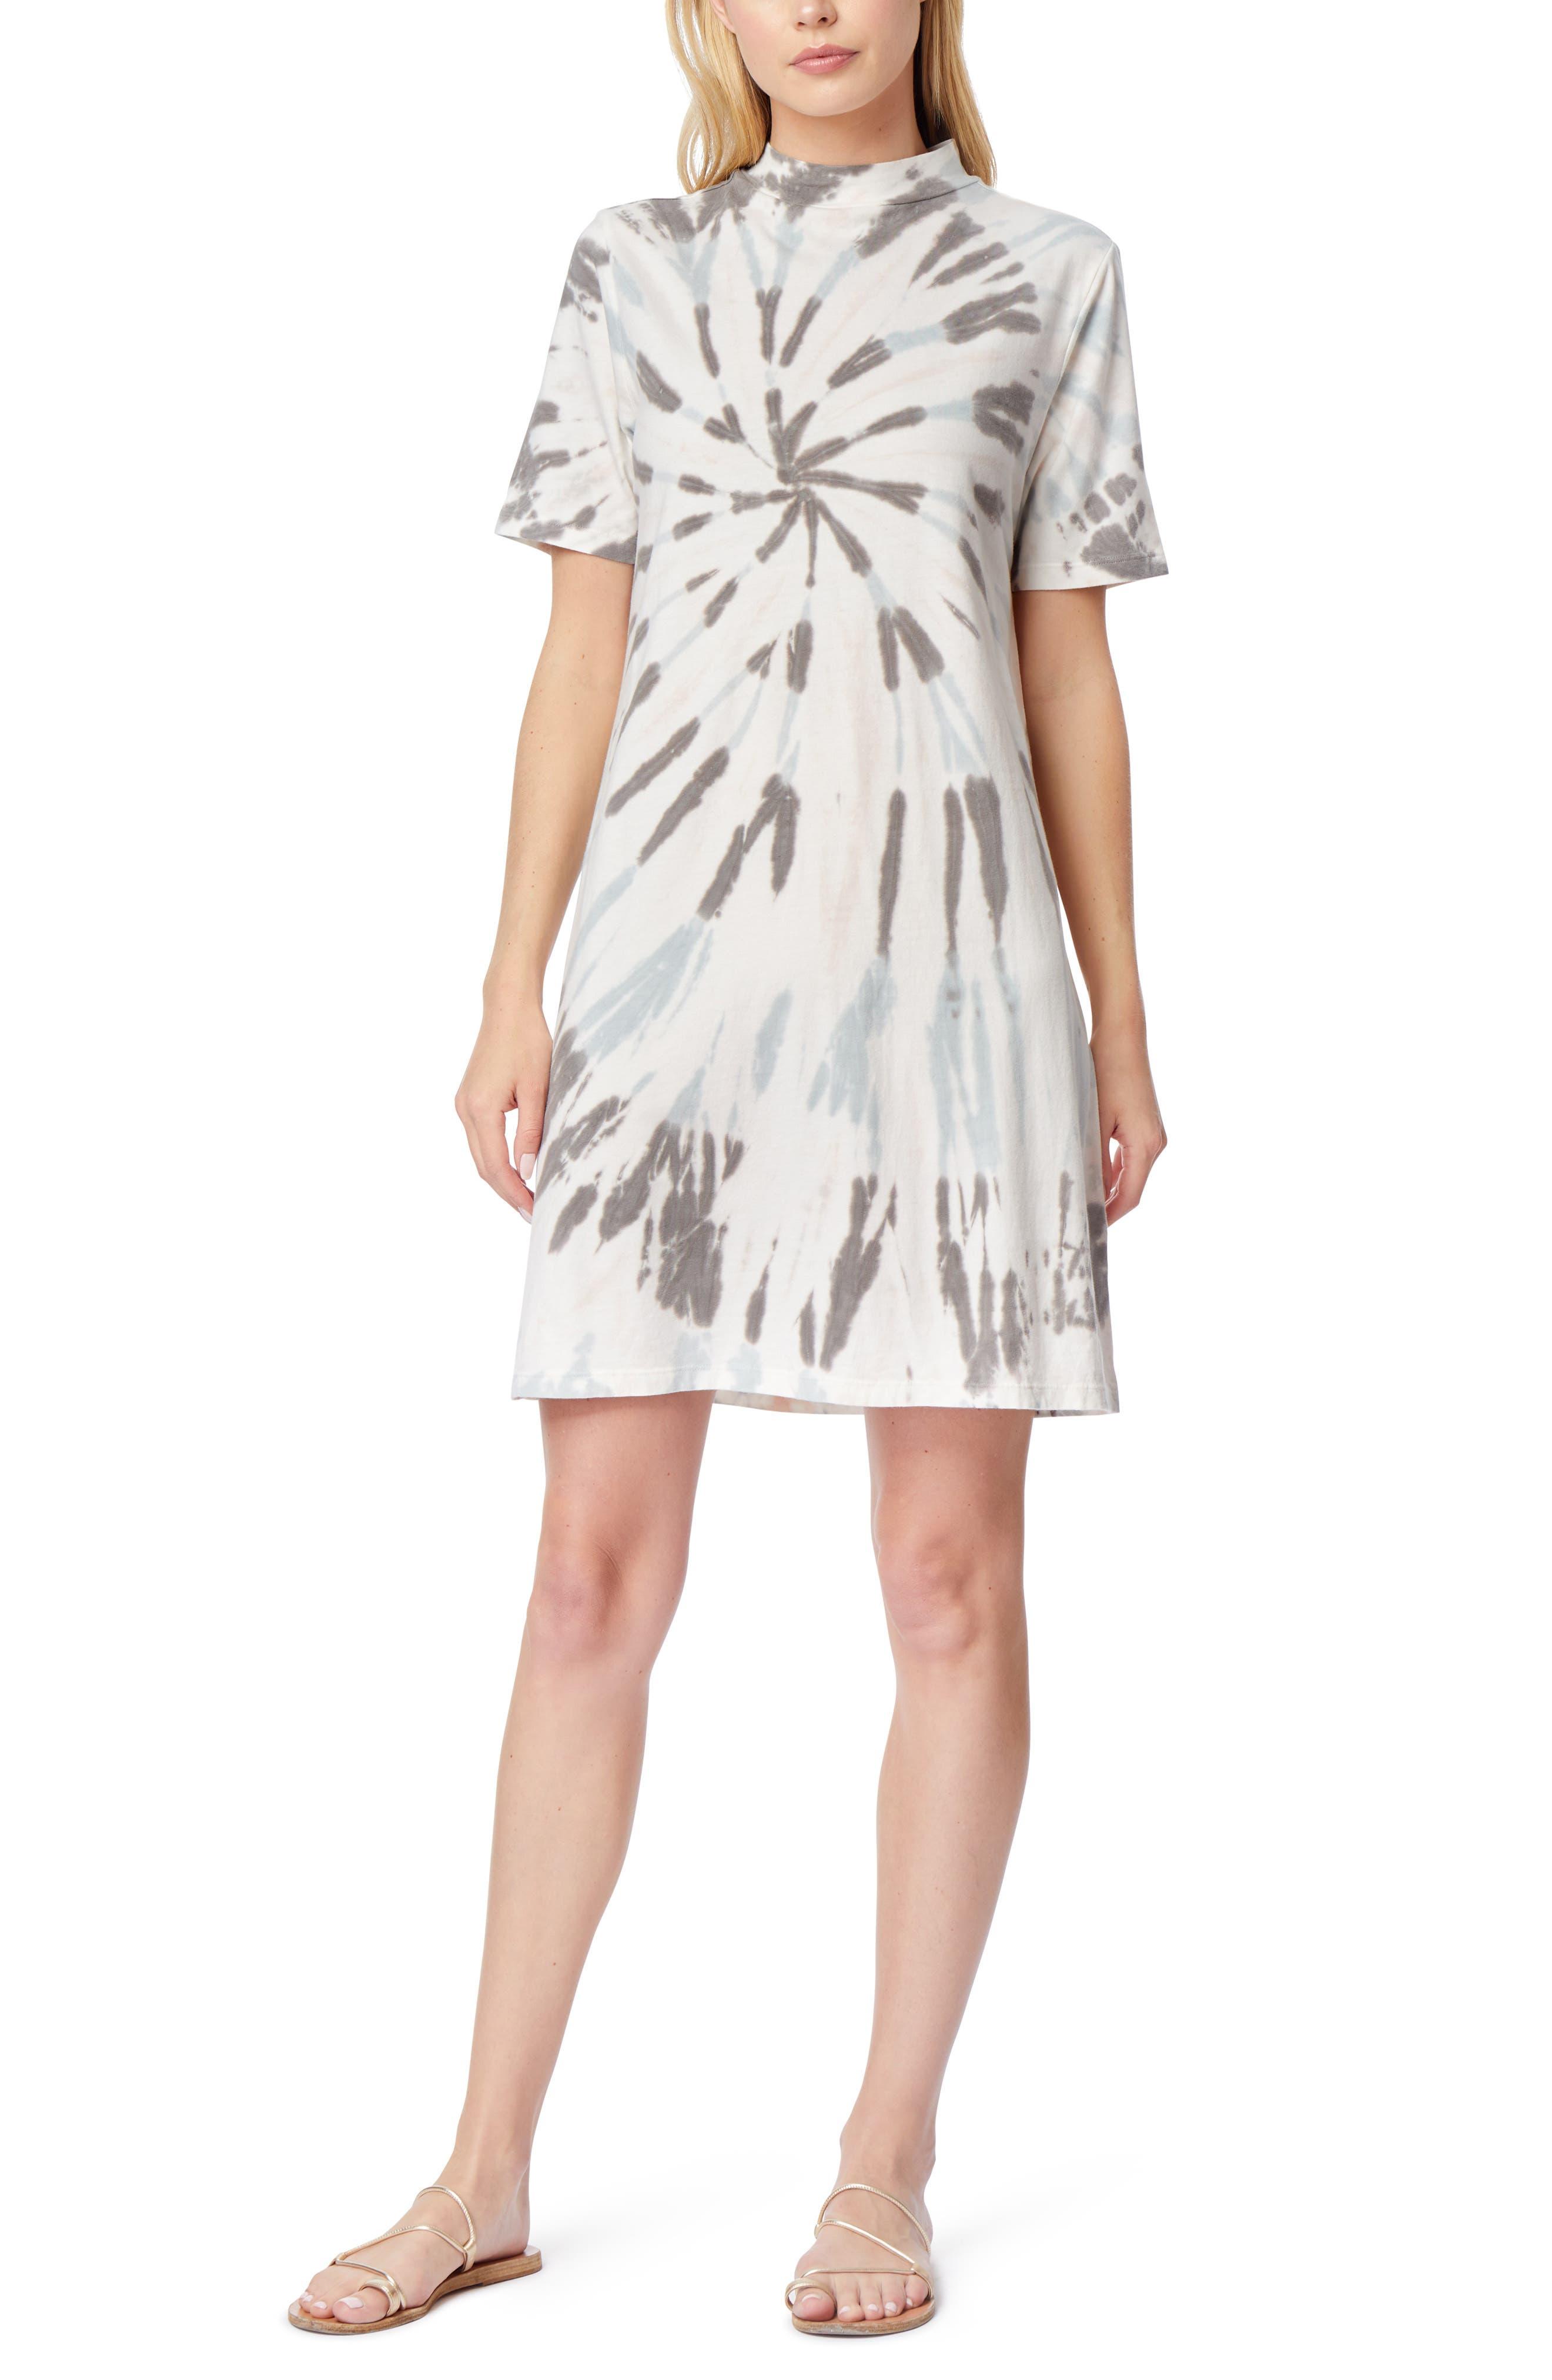 Bea Tie Dye Mock Neck T-Shirt Dress